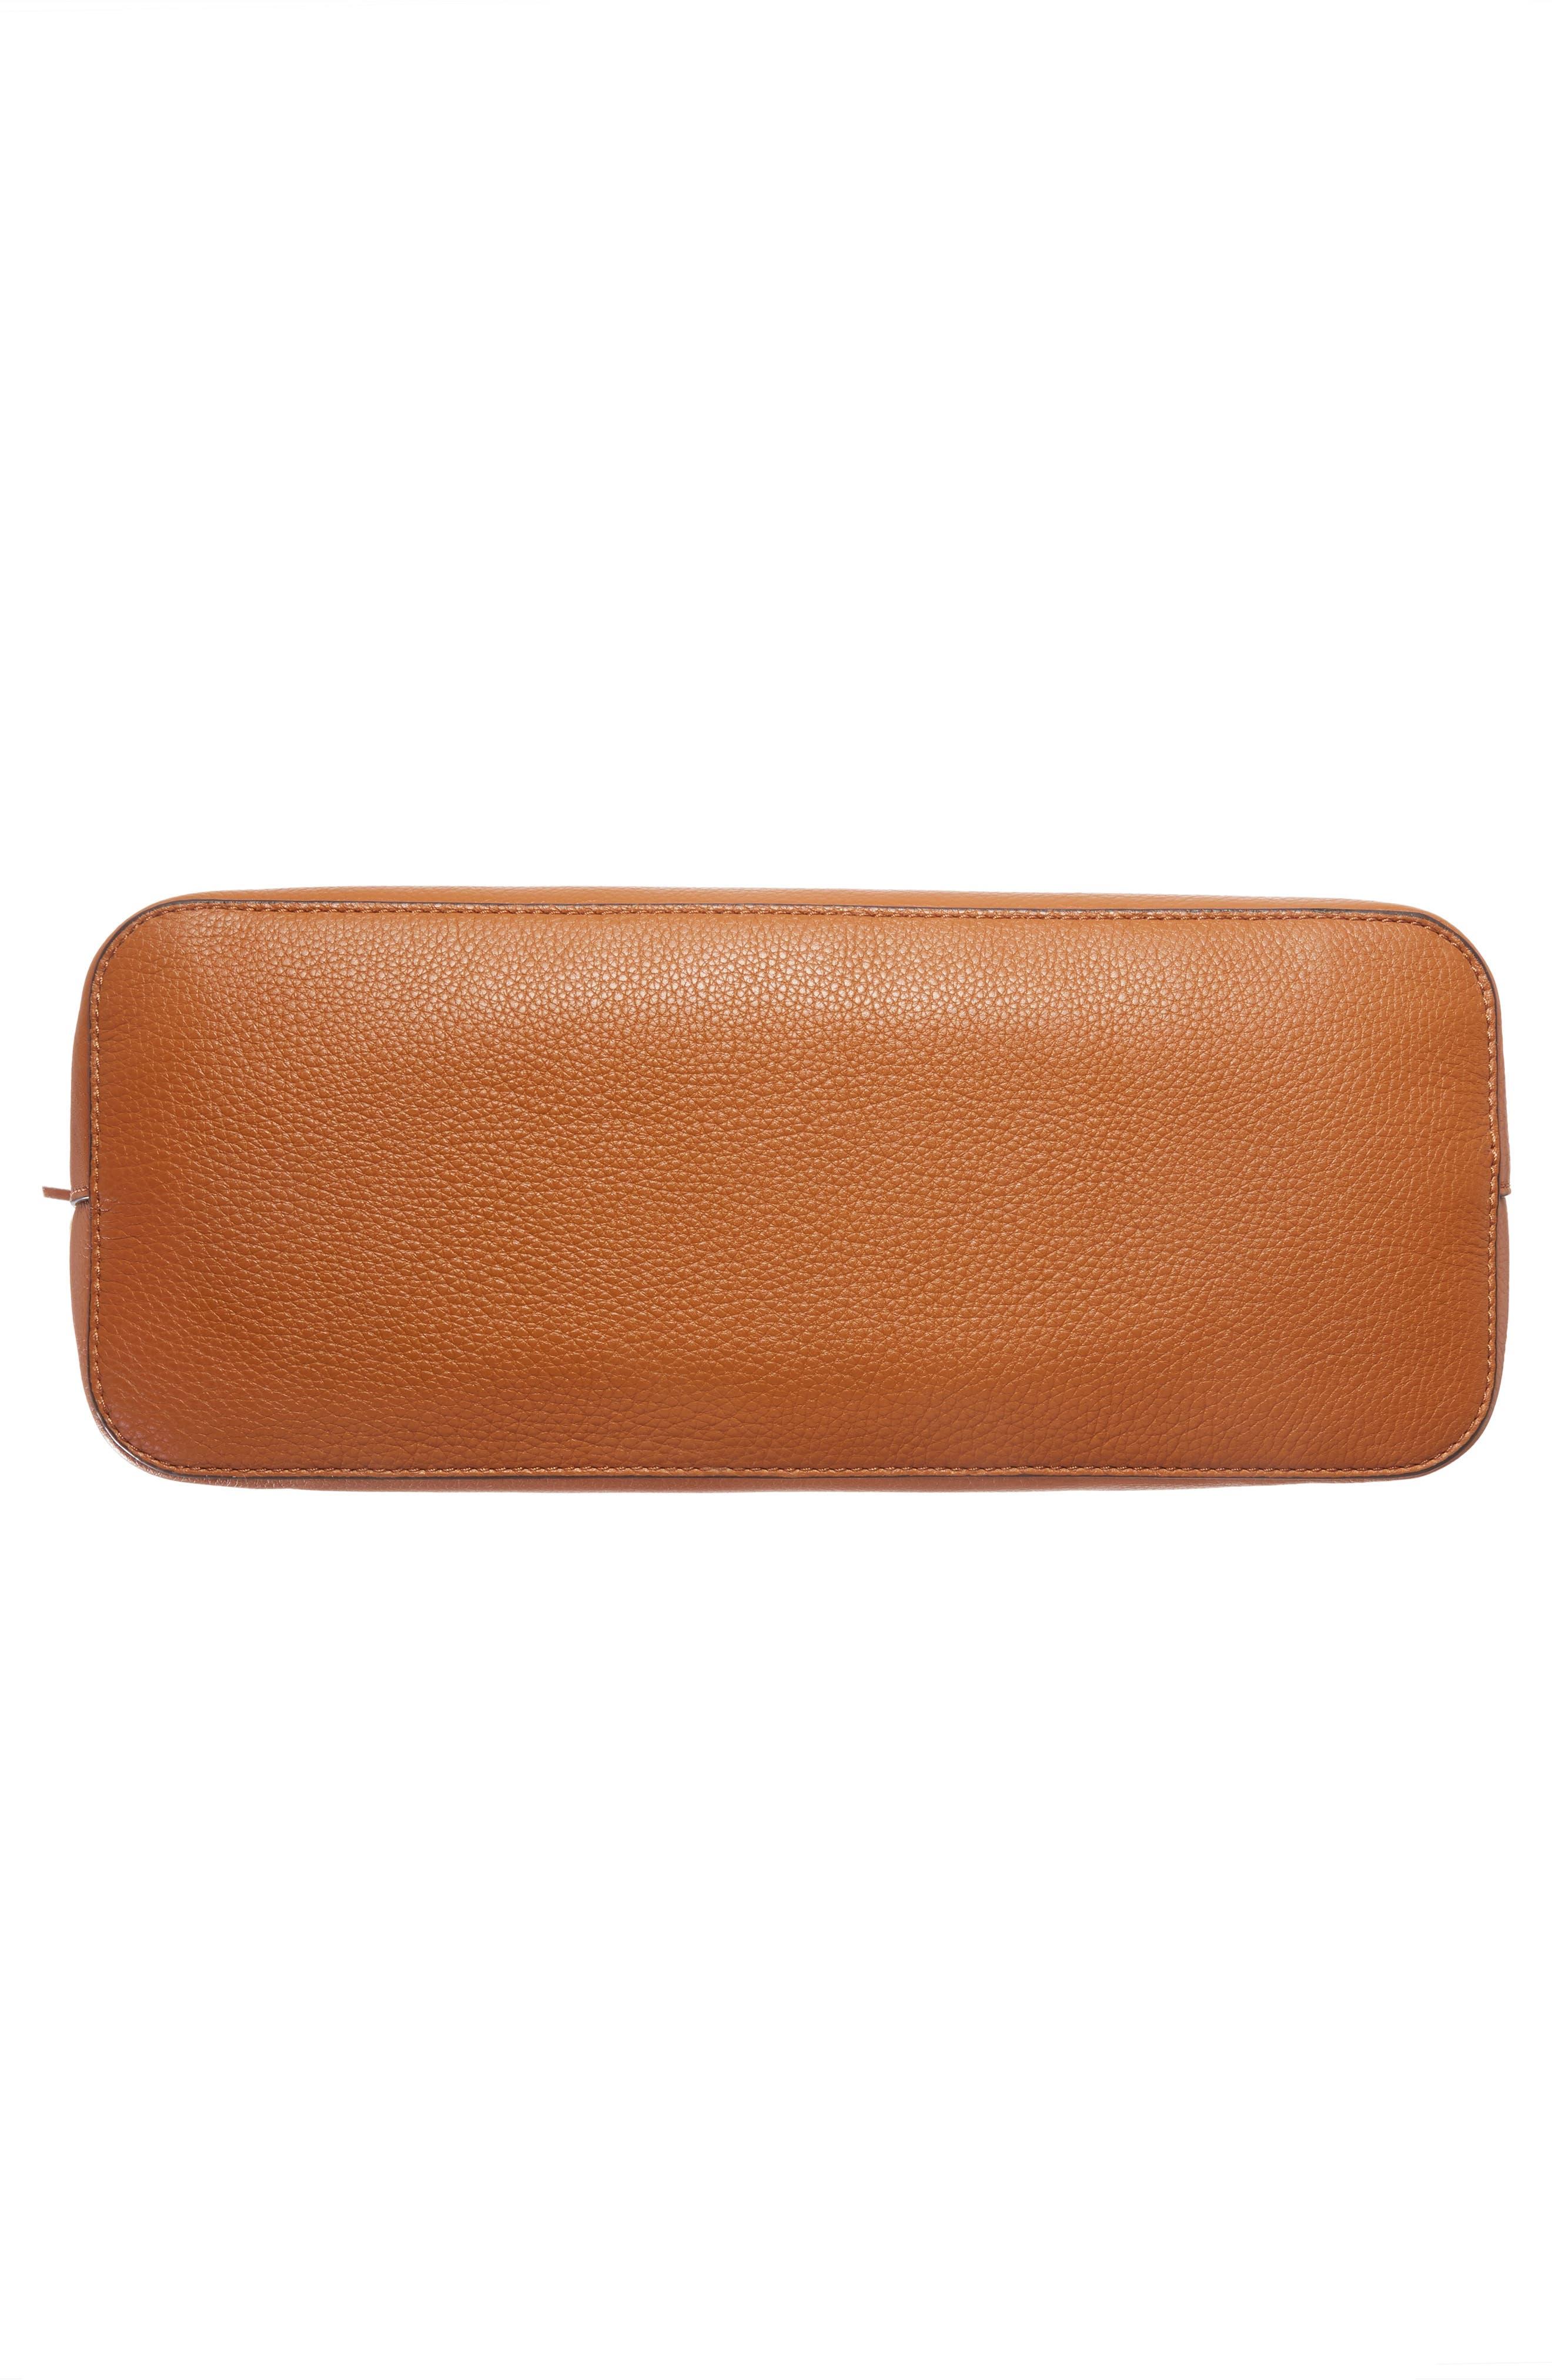 Alternate Image 5  - Tory Burch Taylor Leather Satchel